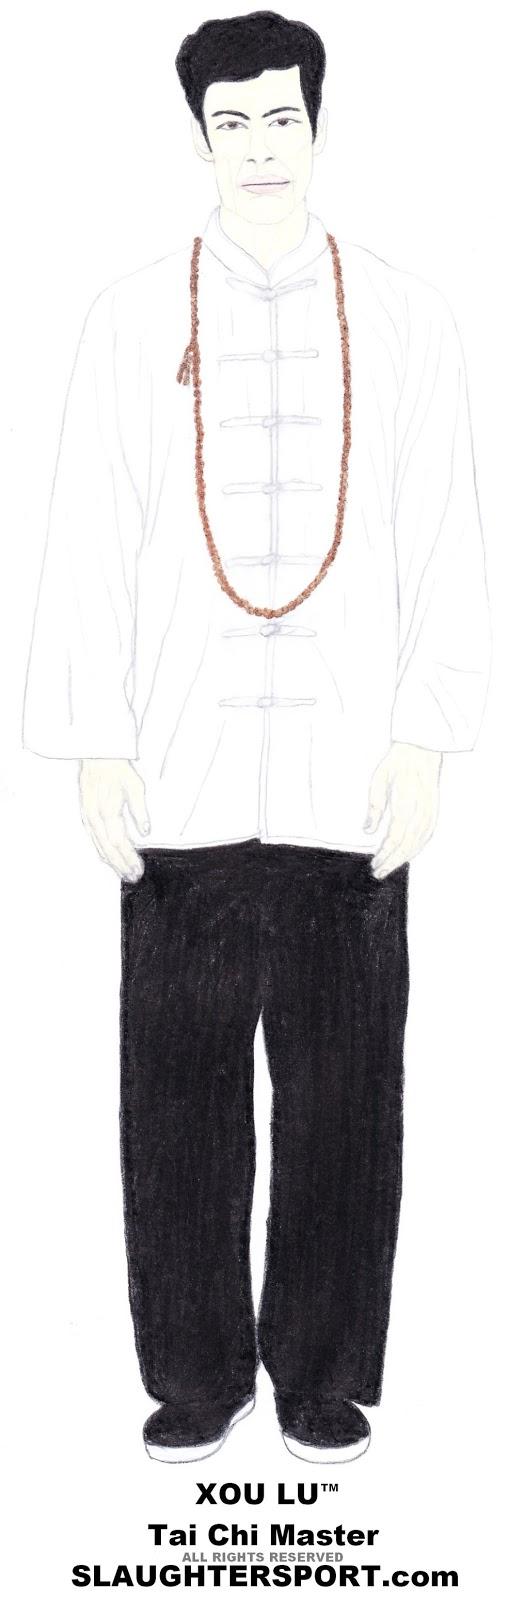 XOU LU Tai Chi Master SLAUGHTERSPORT.COM